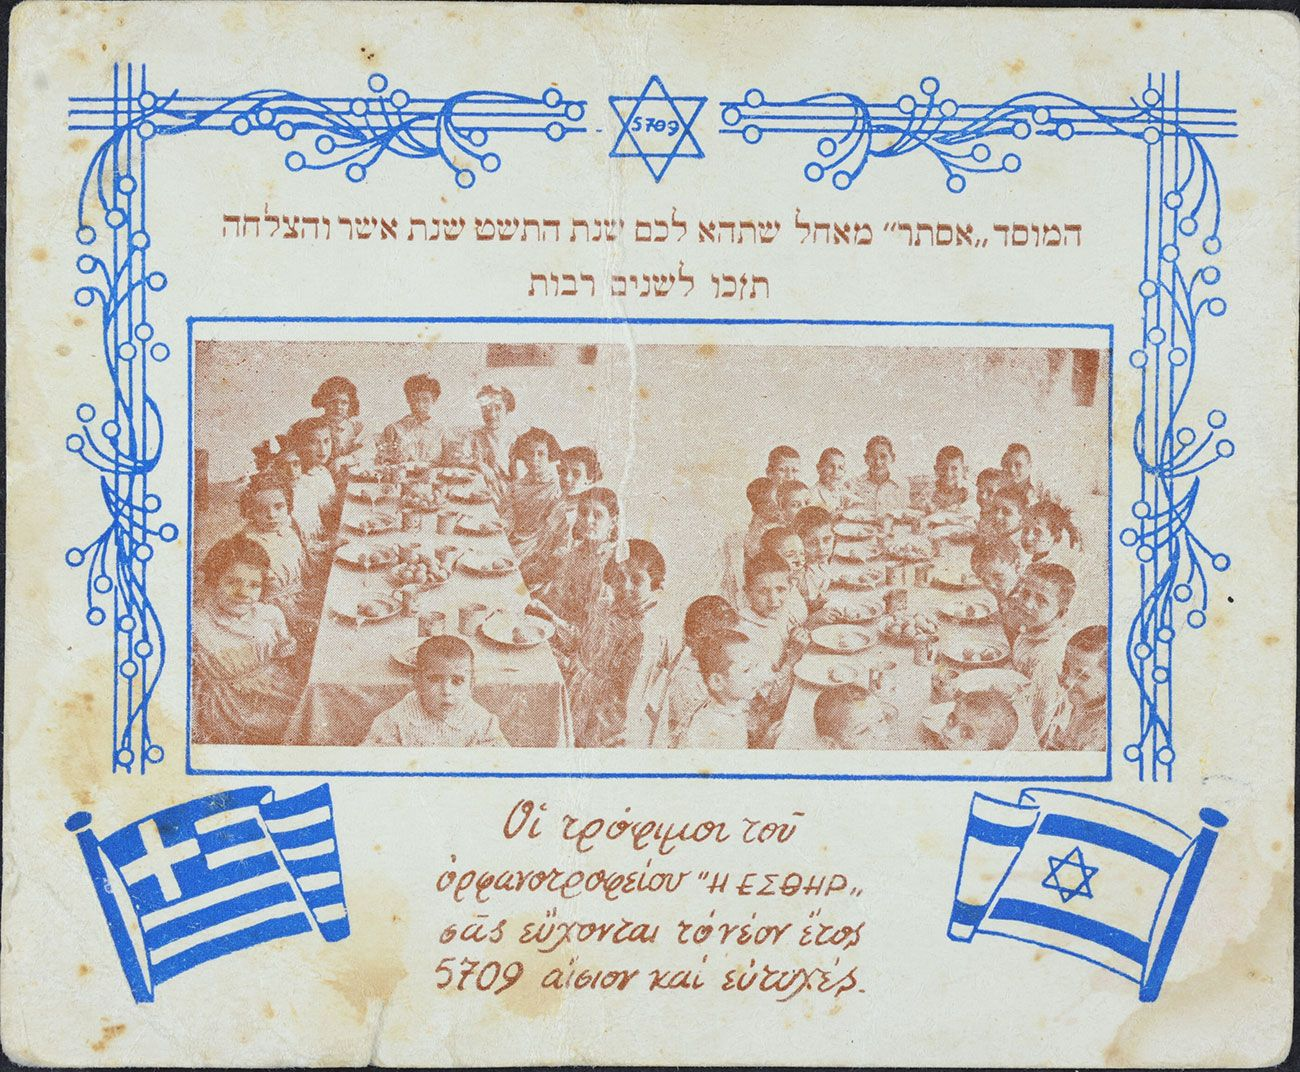 """Shana Tova"" (Happy New Year) card for the Jewish year"